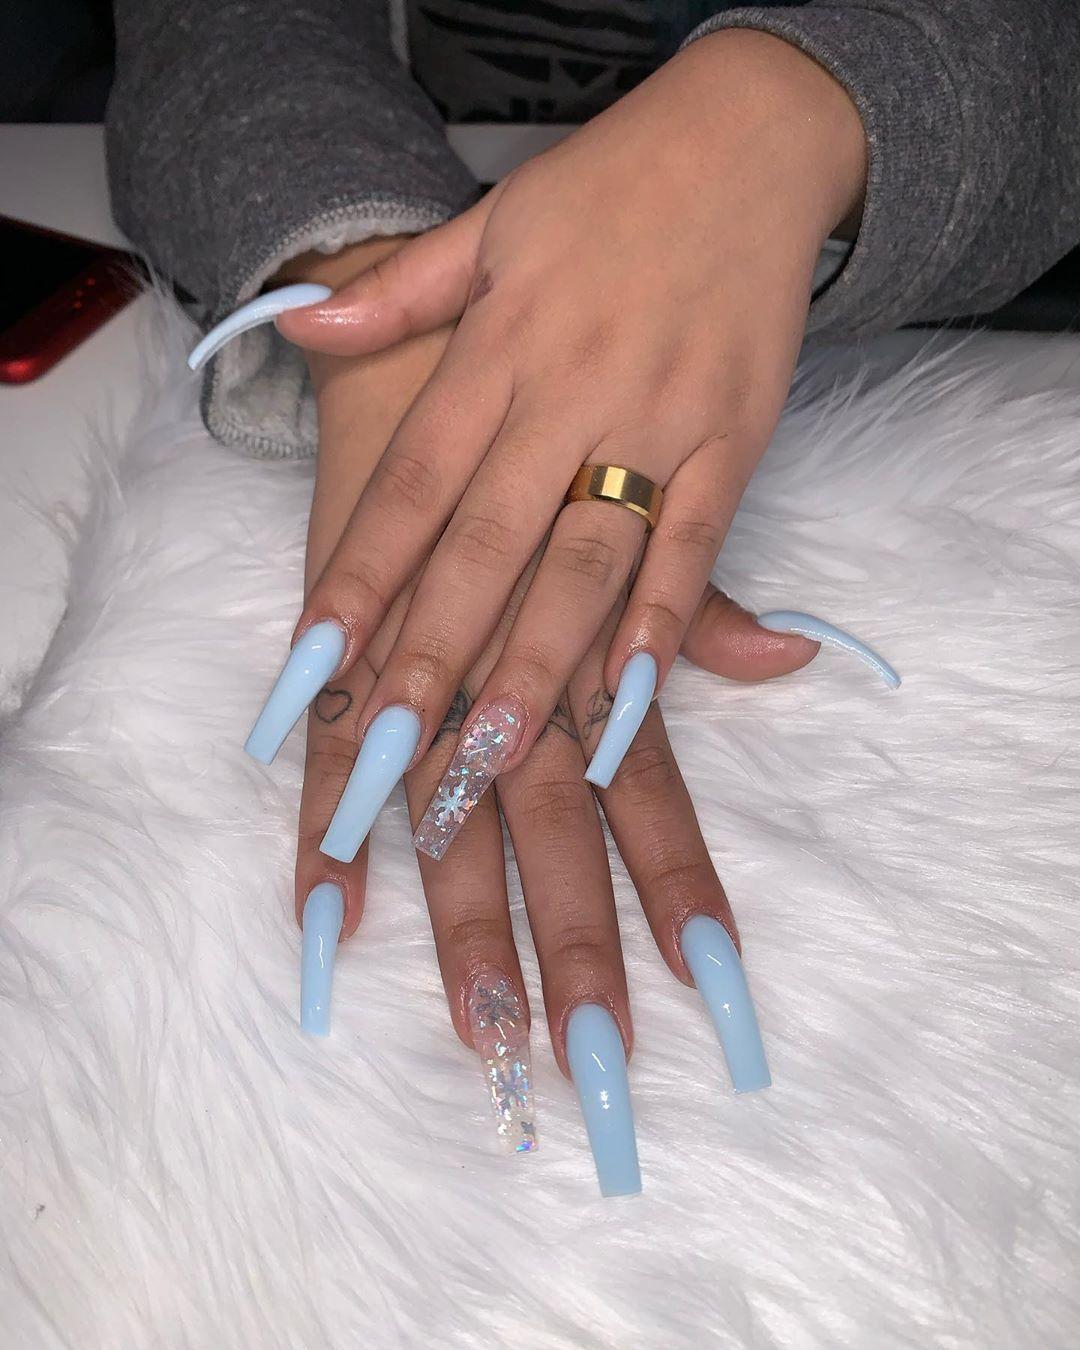 Des On Instagram Iceyyyyyyy Aesthetic Acrylic Nails Fig Blog In 2020 Blue Acrylic Nails Long Acrylic Nails Acrylic Nails